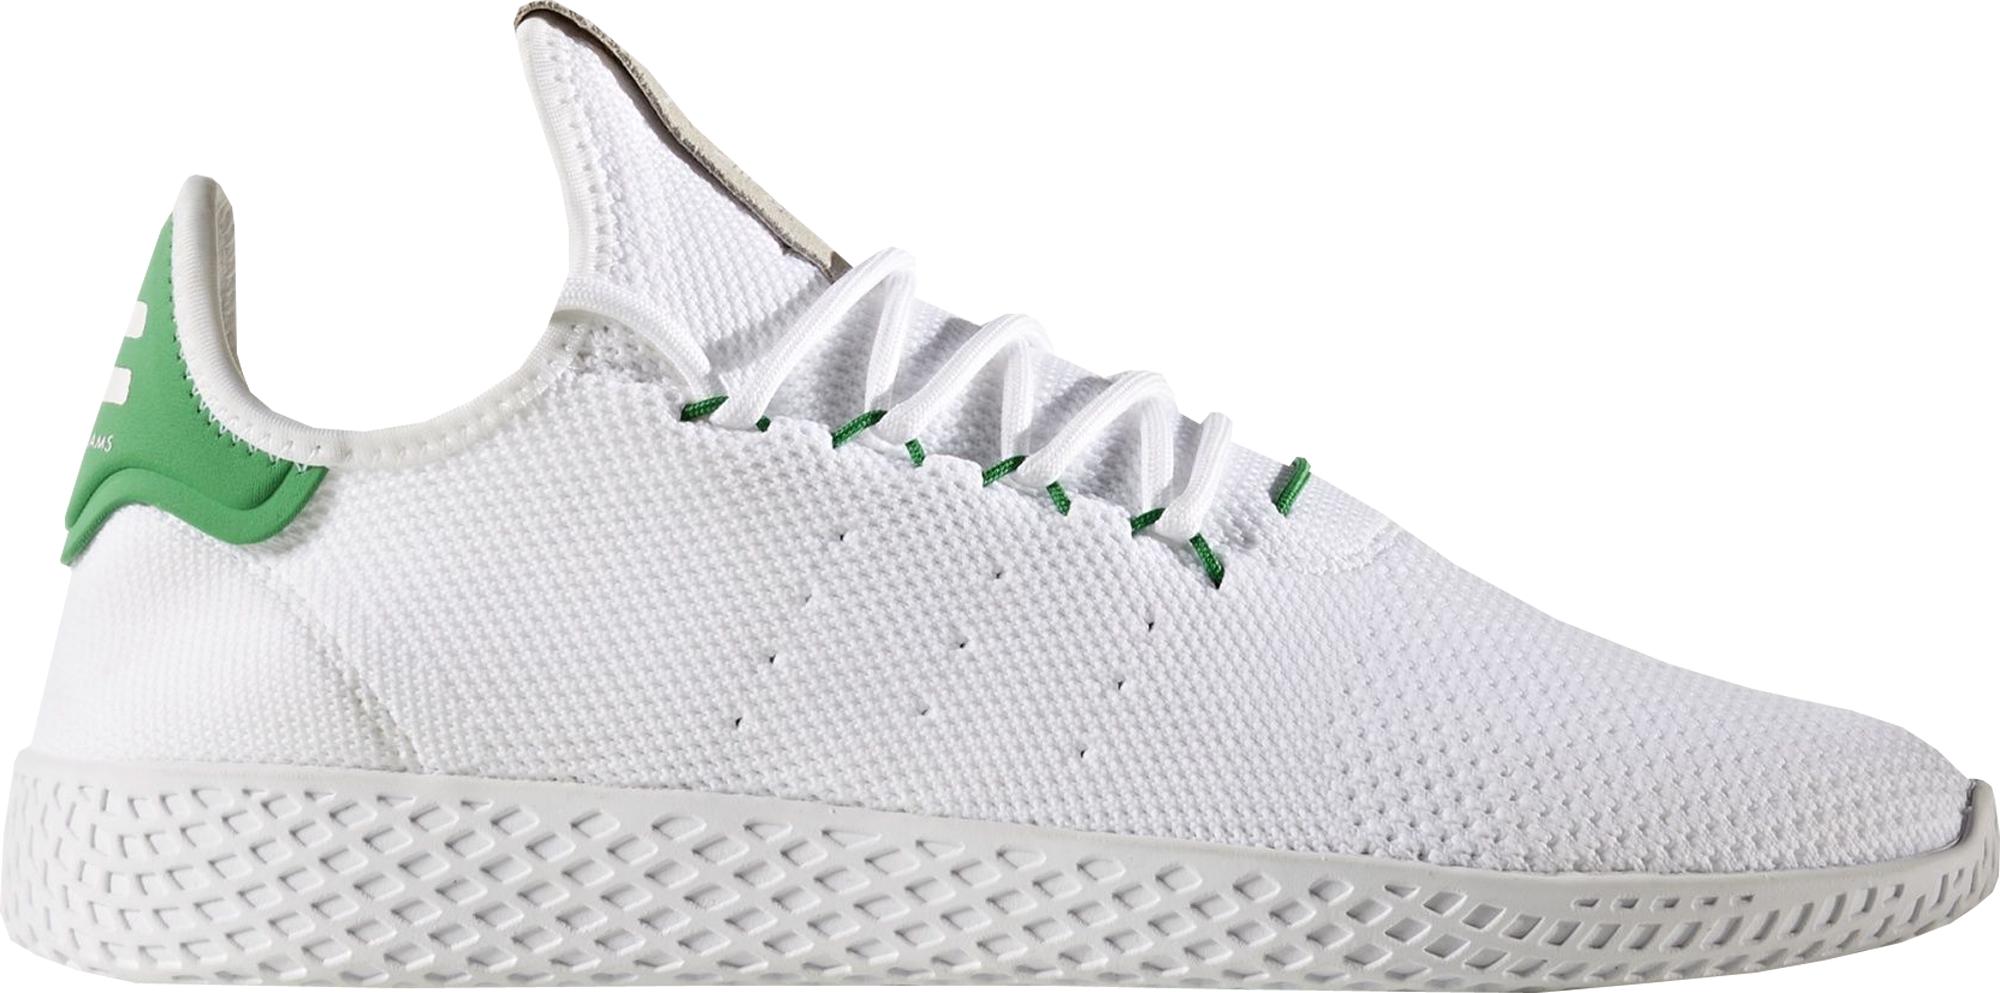 adidas Tennis HU Pharrell White Green